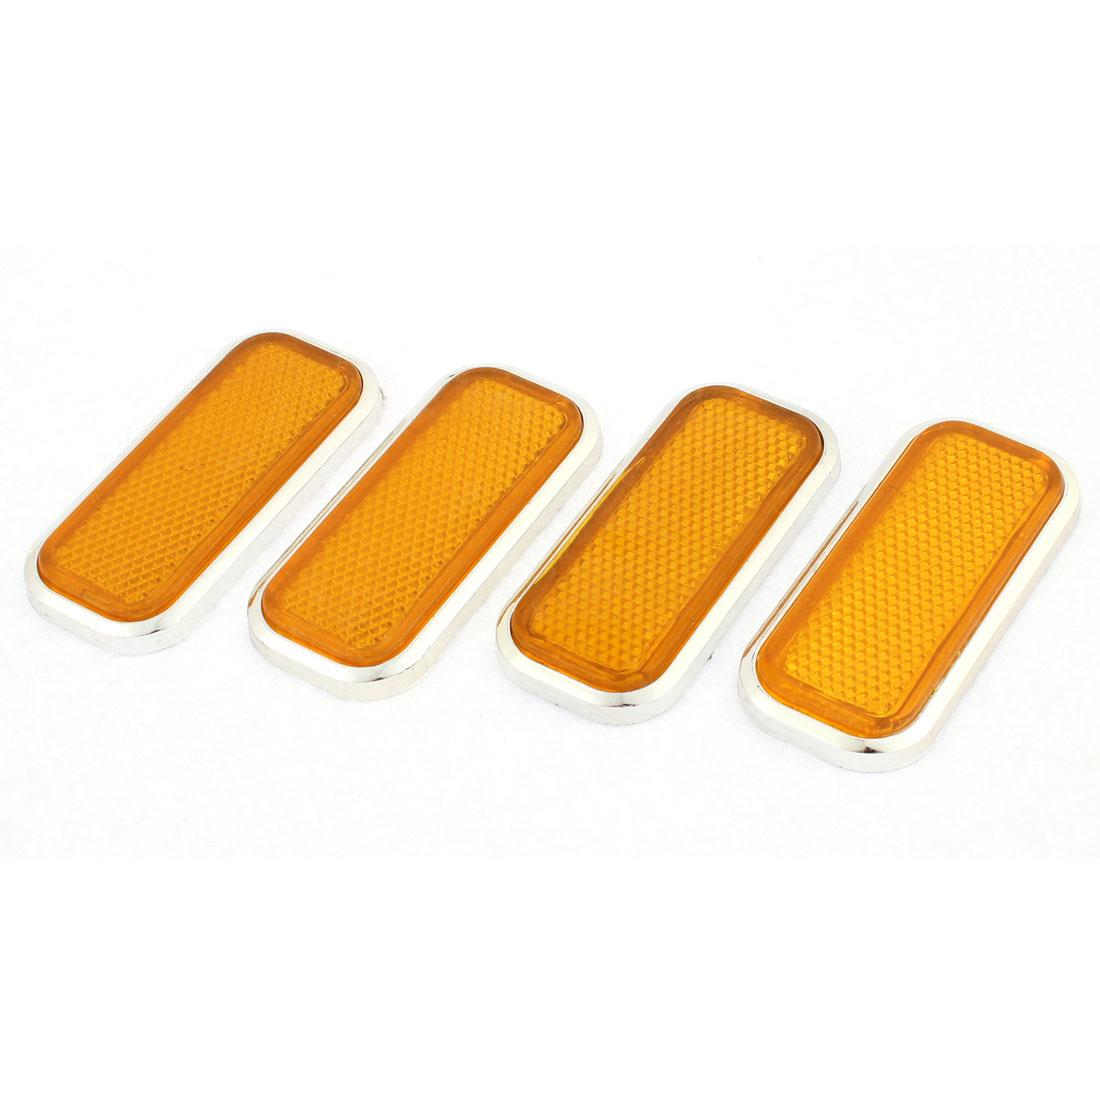 4Pcs Metal Adhesive Auto Car Plastic Square Reflective Reflector Sticker